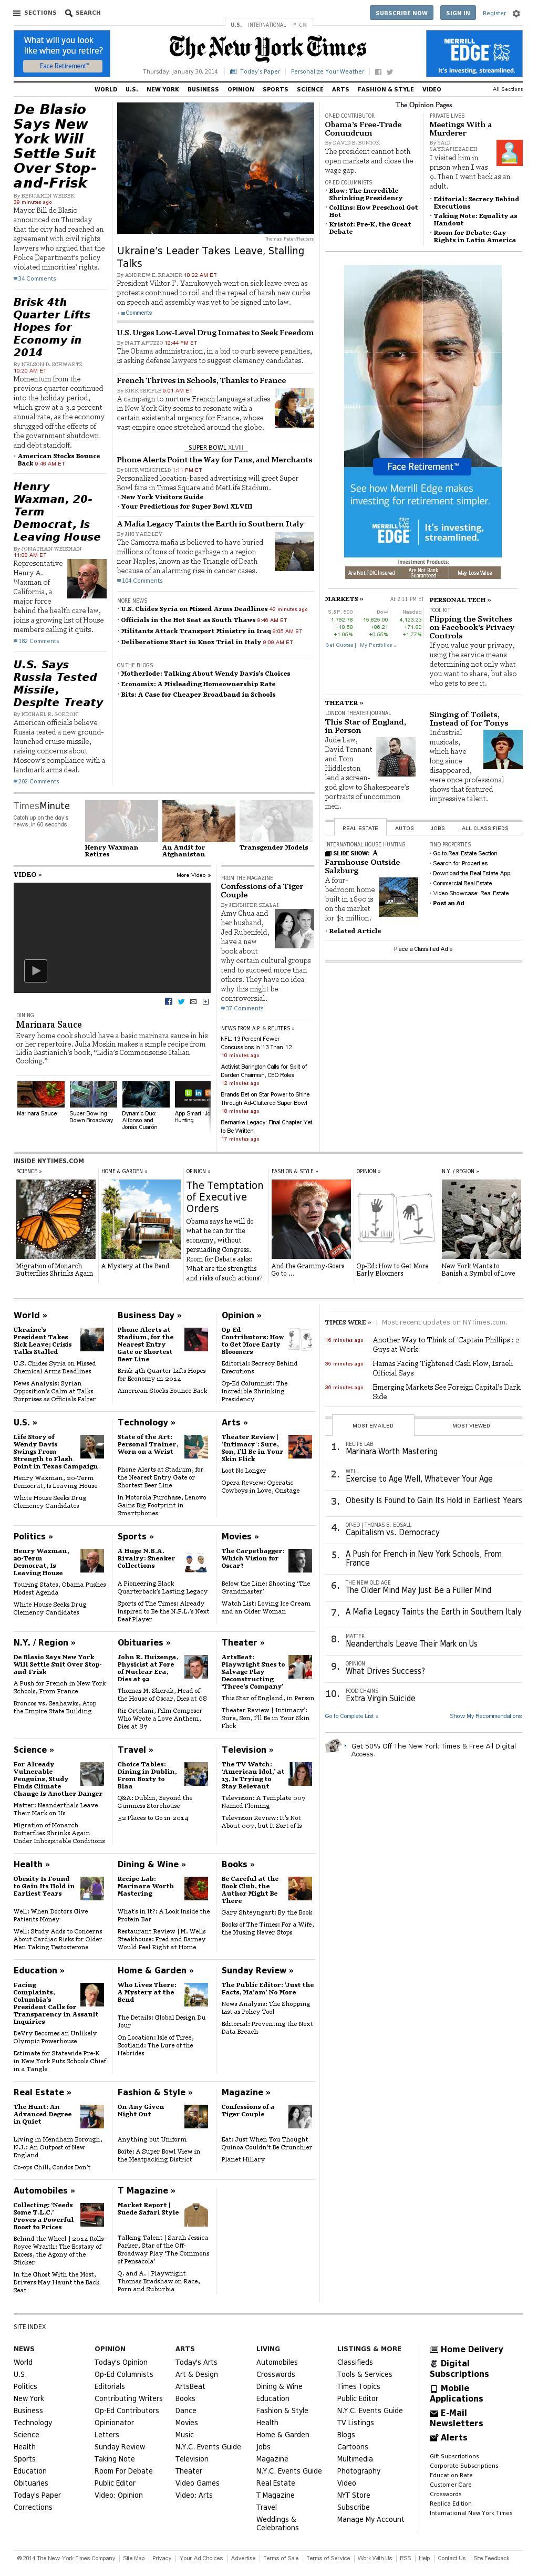 The New York Times at Thursday Jan. 30, 2014, 7:15 p.m. UTC